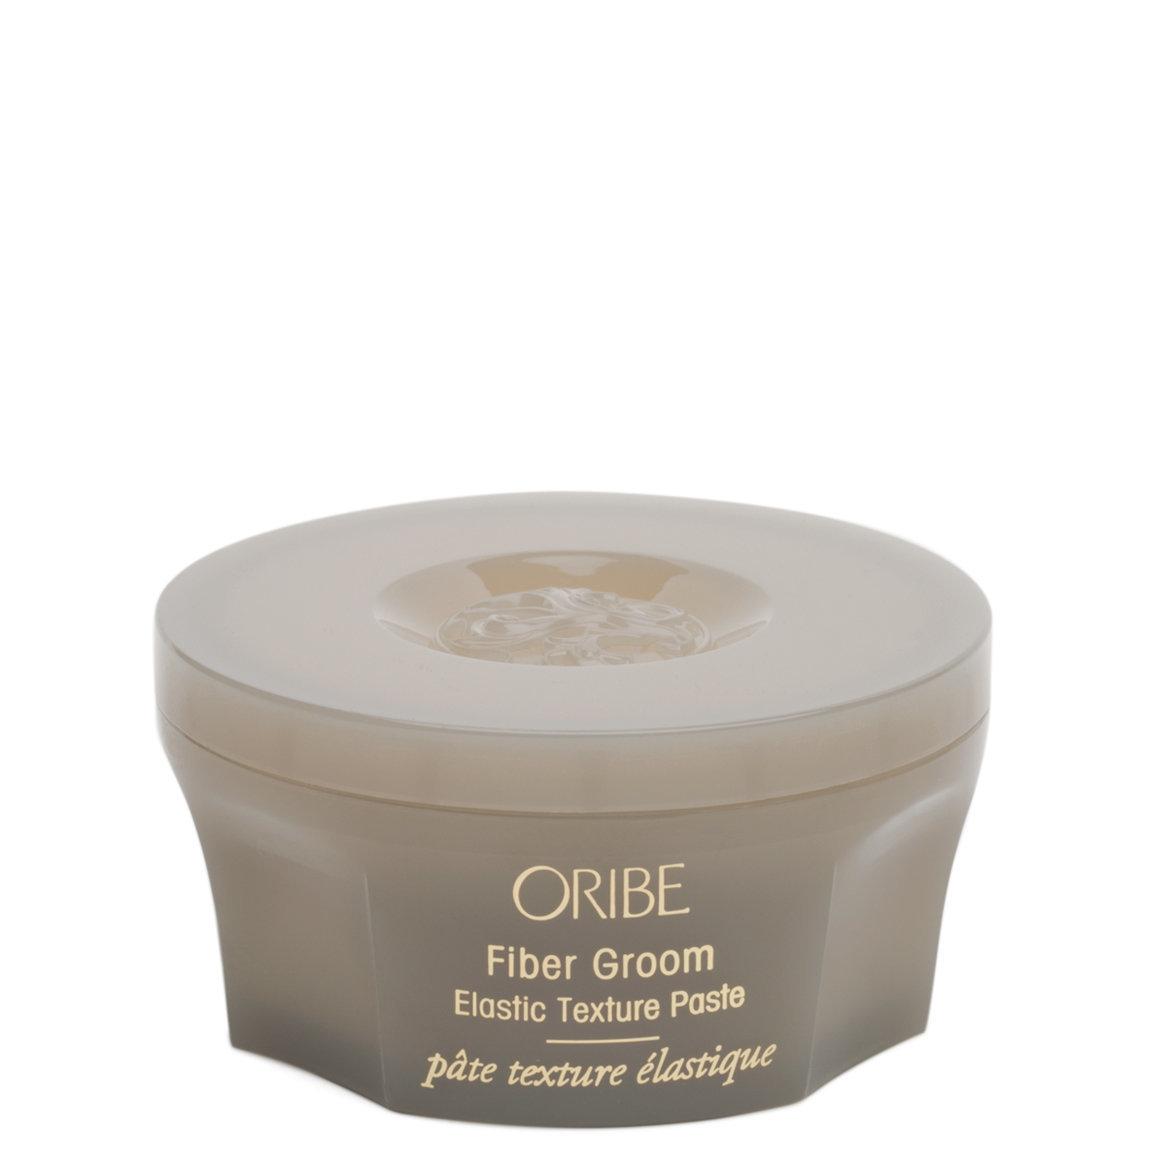 Oribe Fiber Groom product swatch.